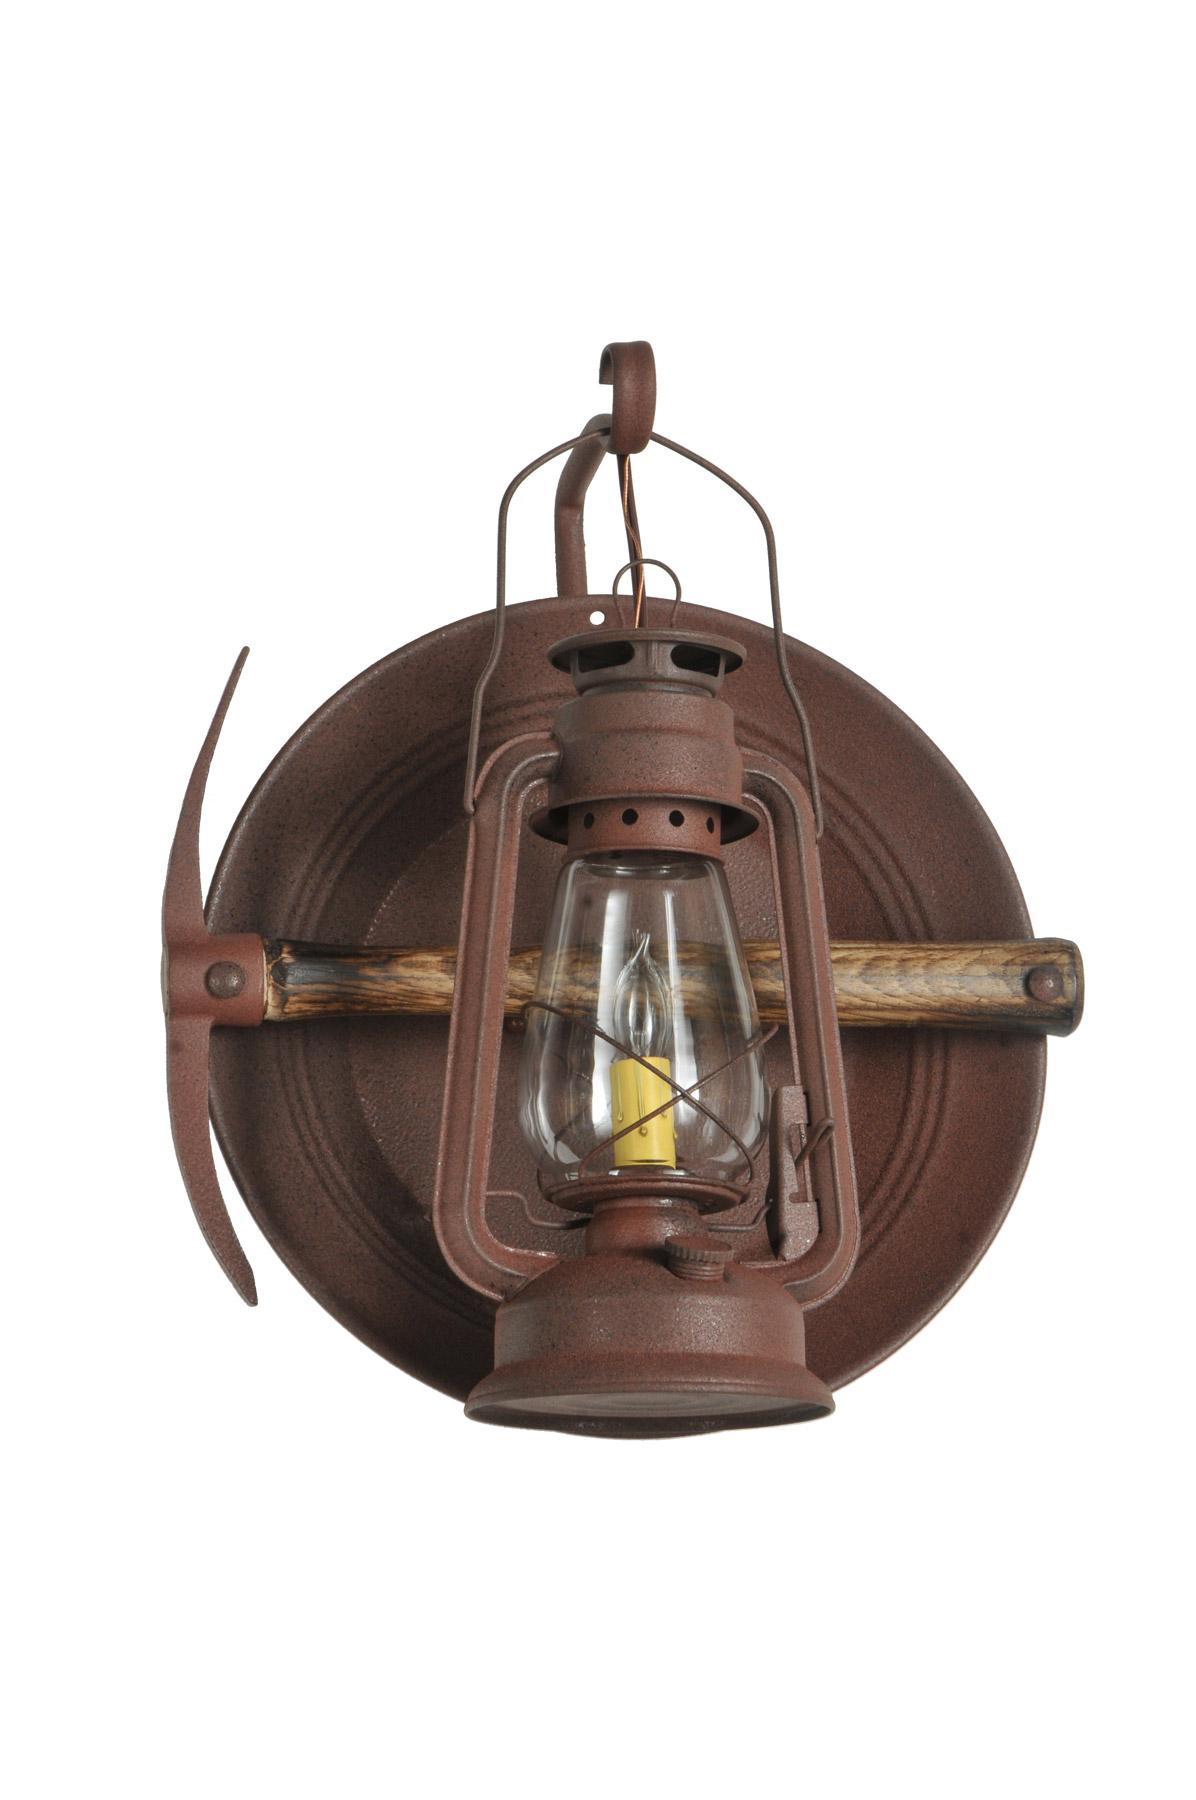 Meyda 114829 Miners Lantern Wall Sconce